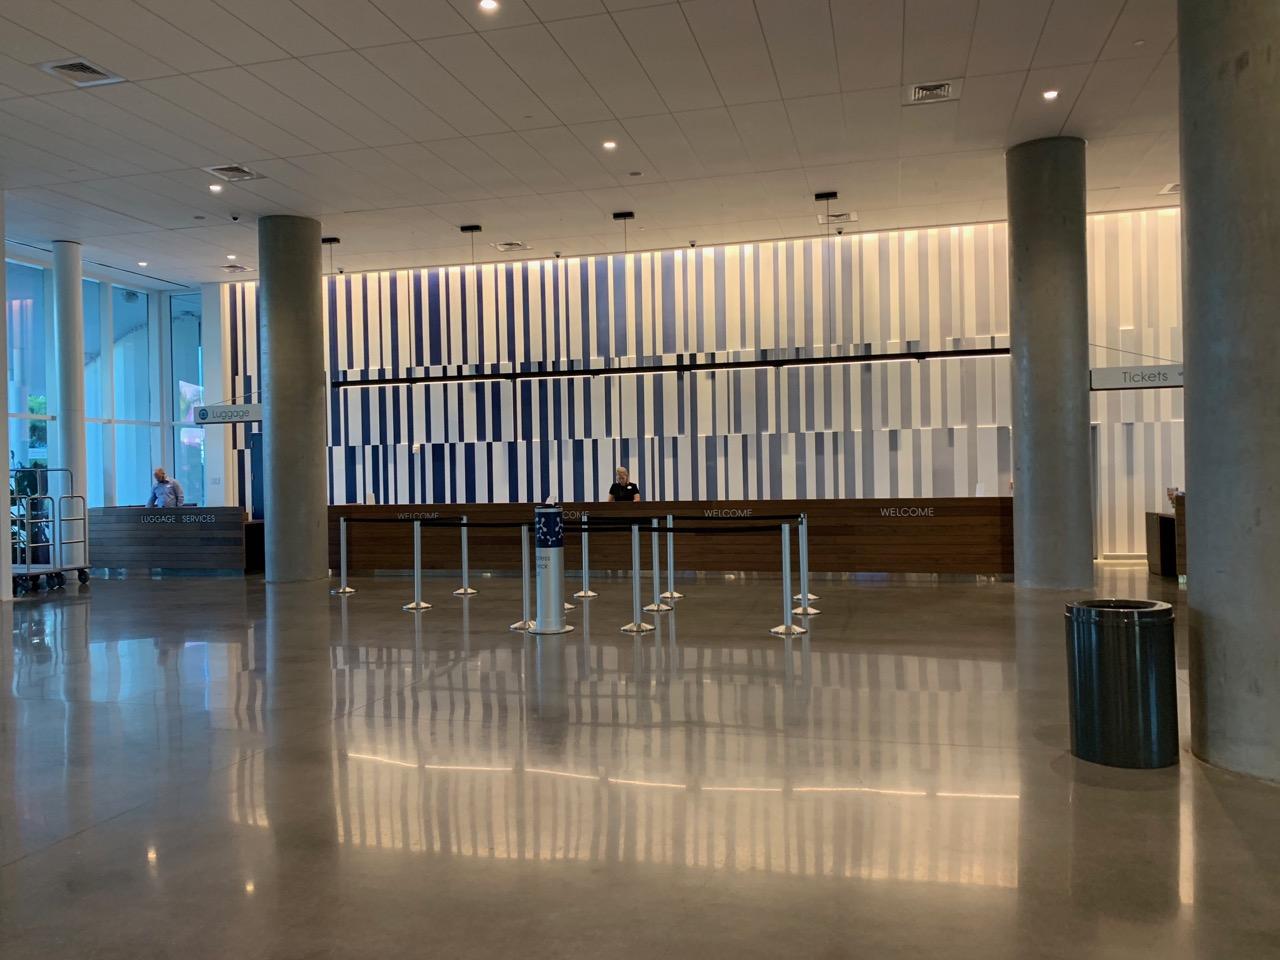 universal aventura hotel review lobby 1.jpeg